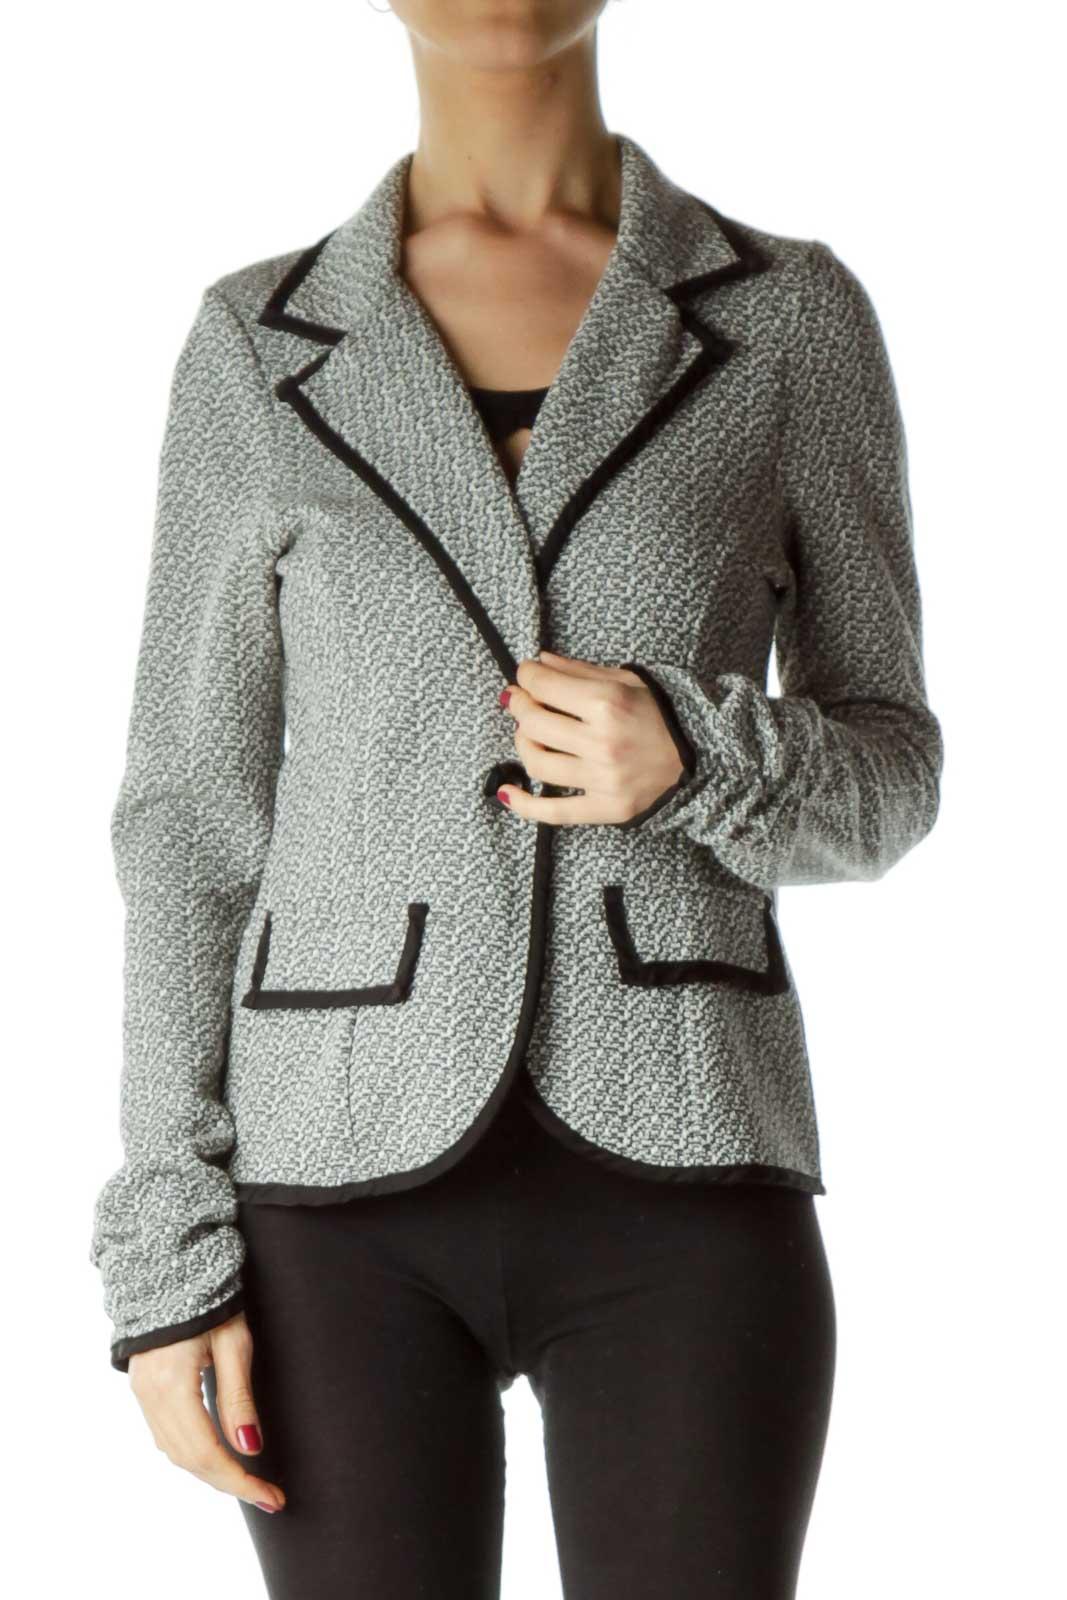 Black White Mottled Knit Jacket